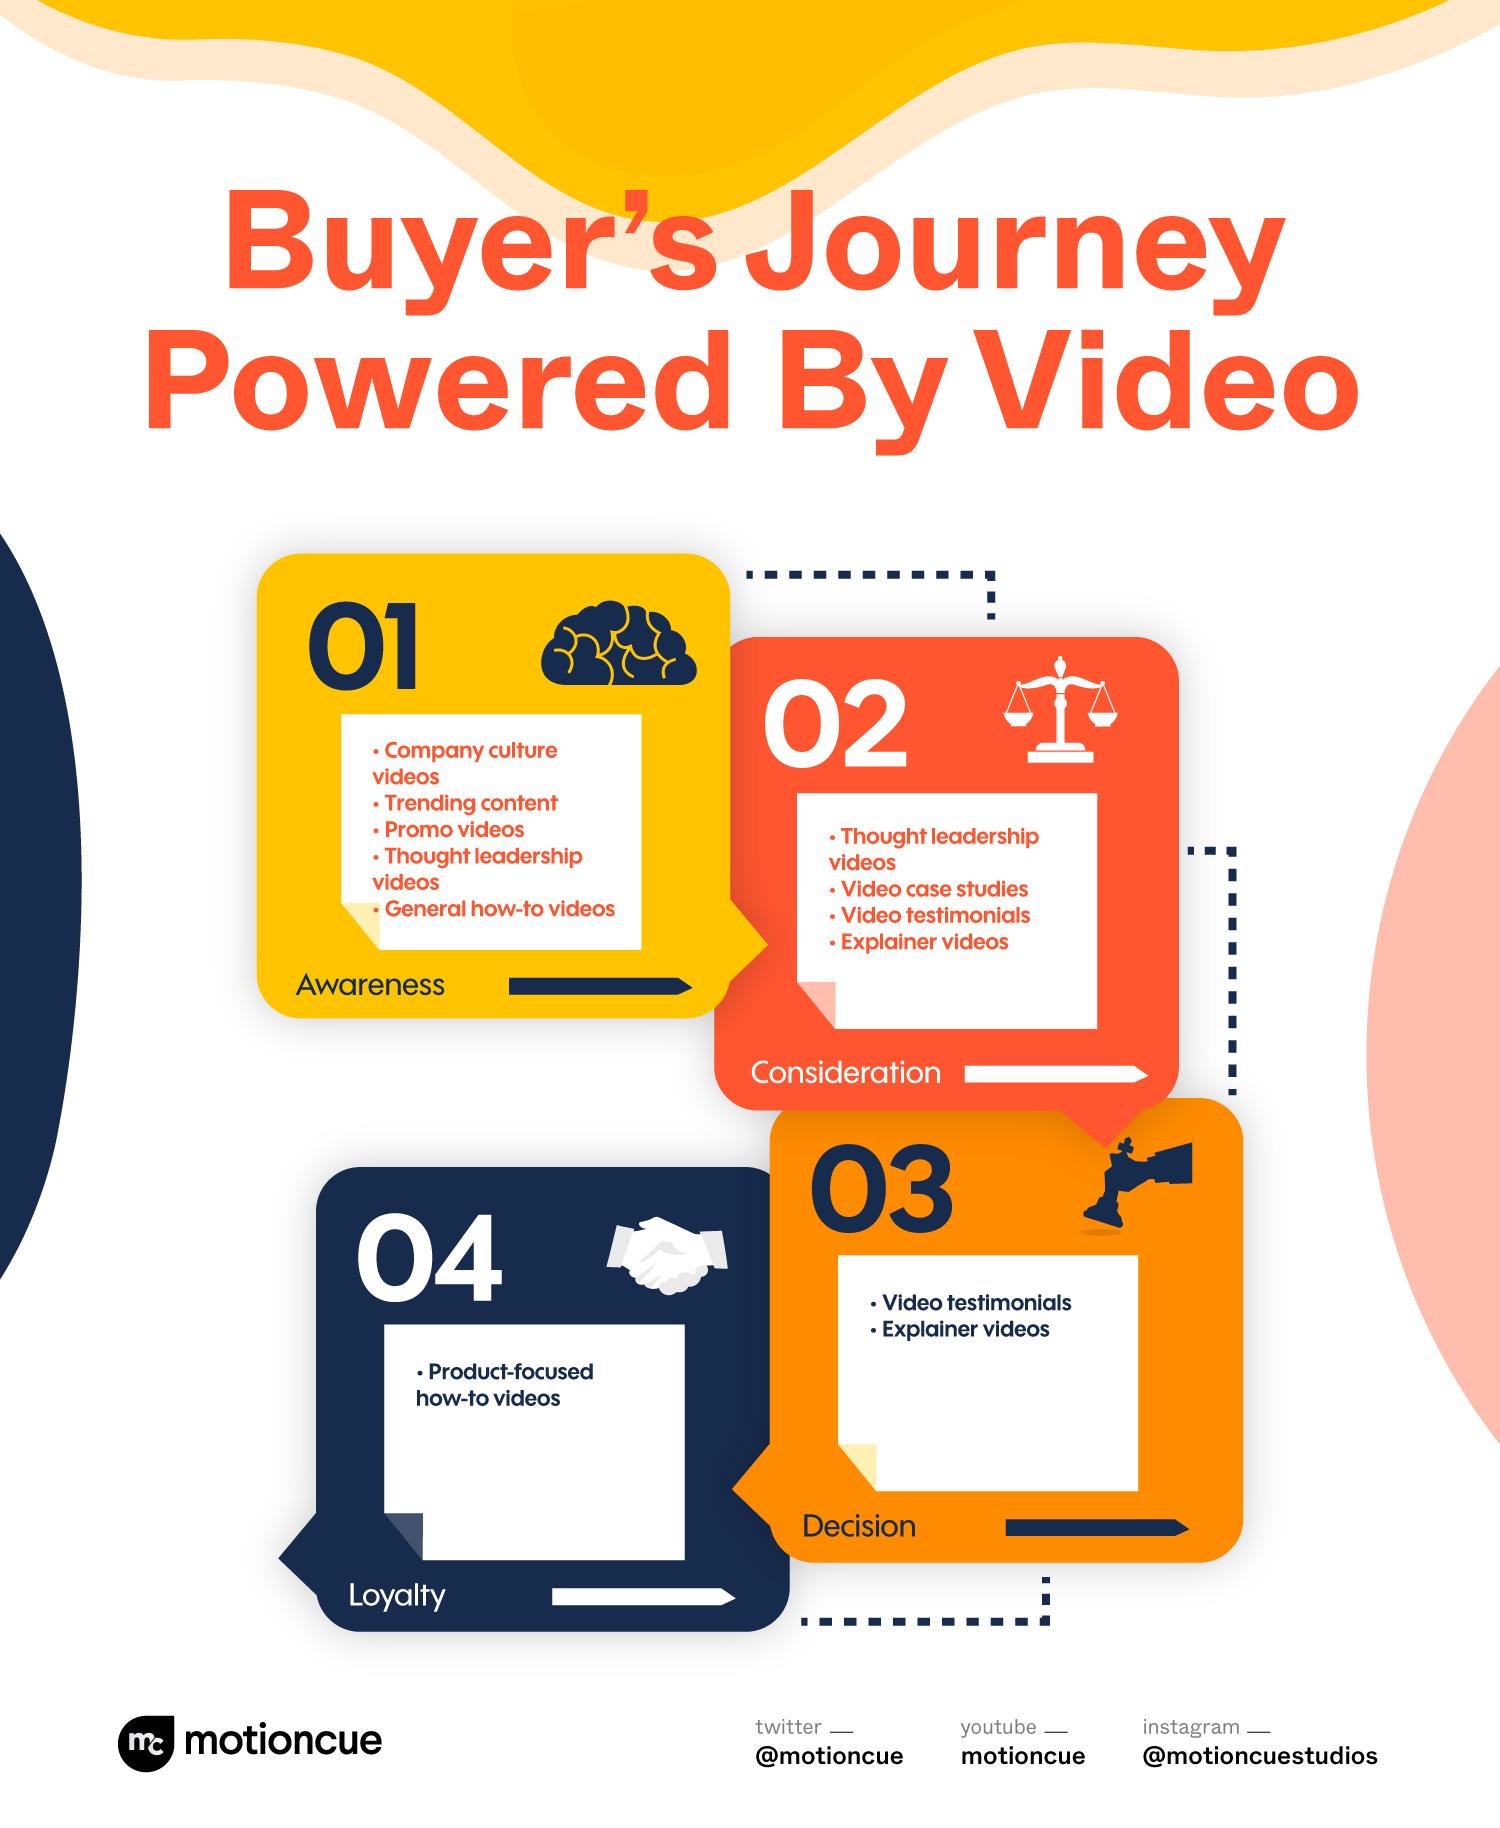 B2B video in the buyer's journey